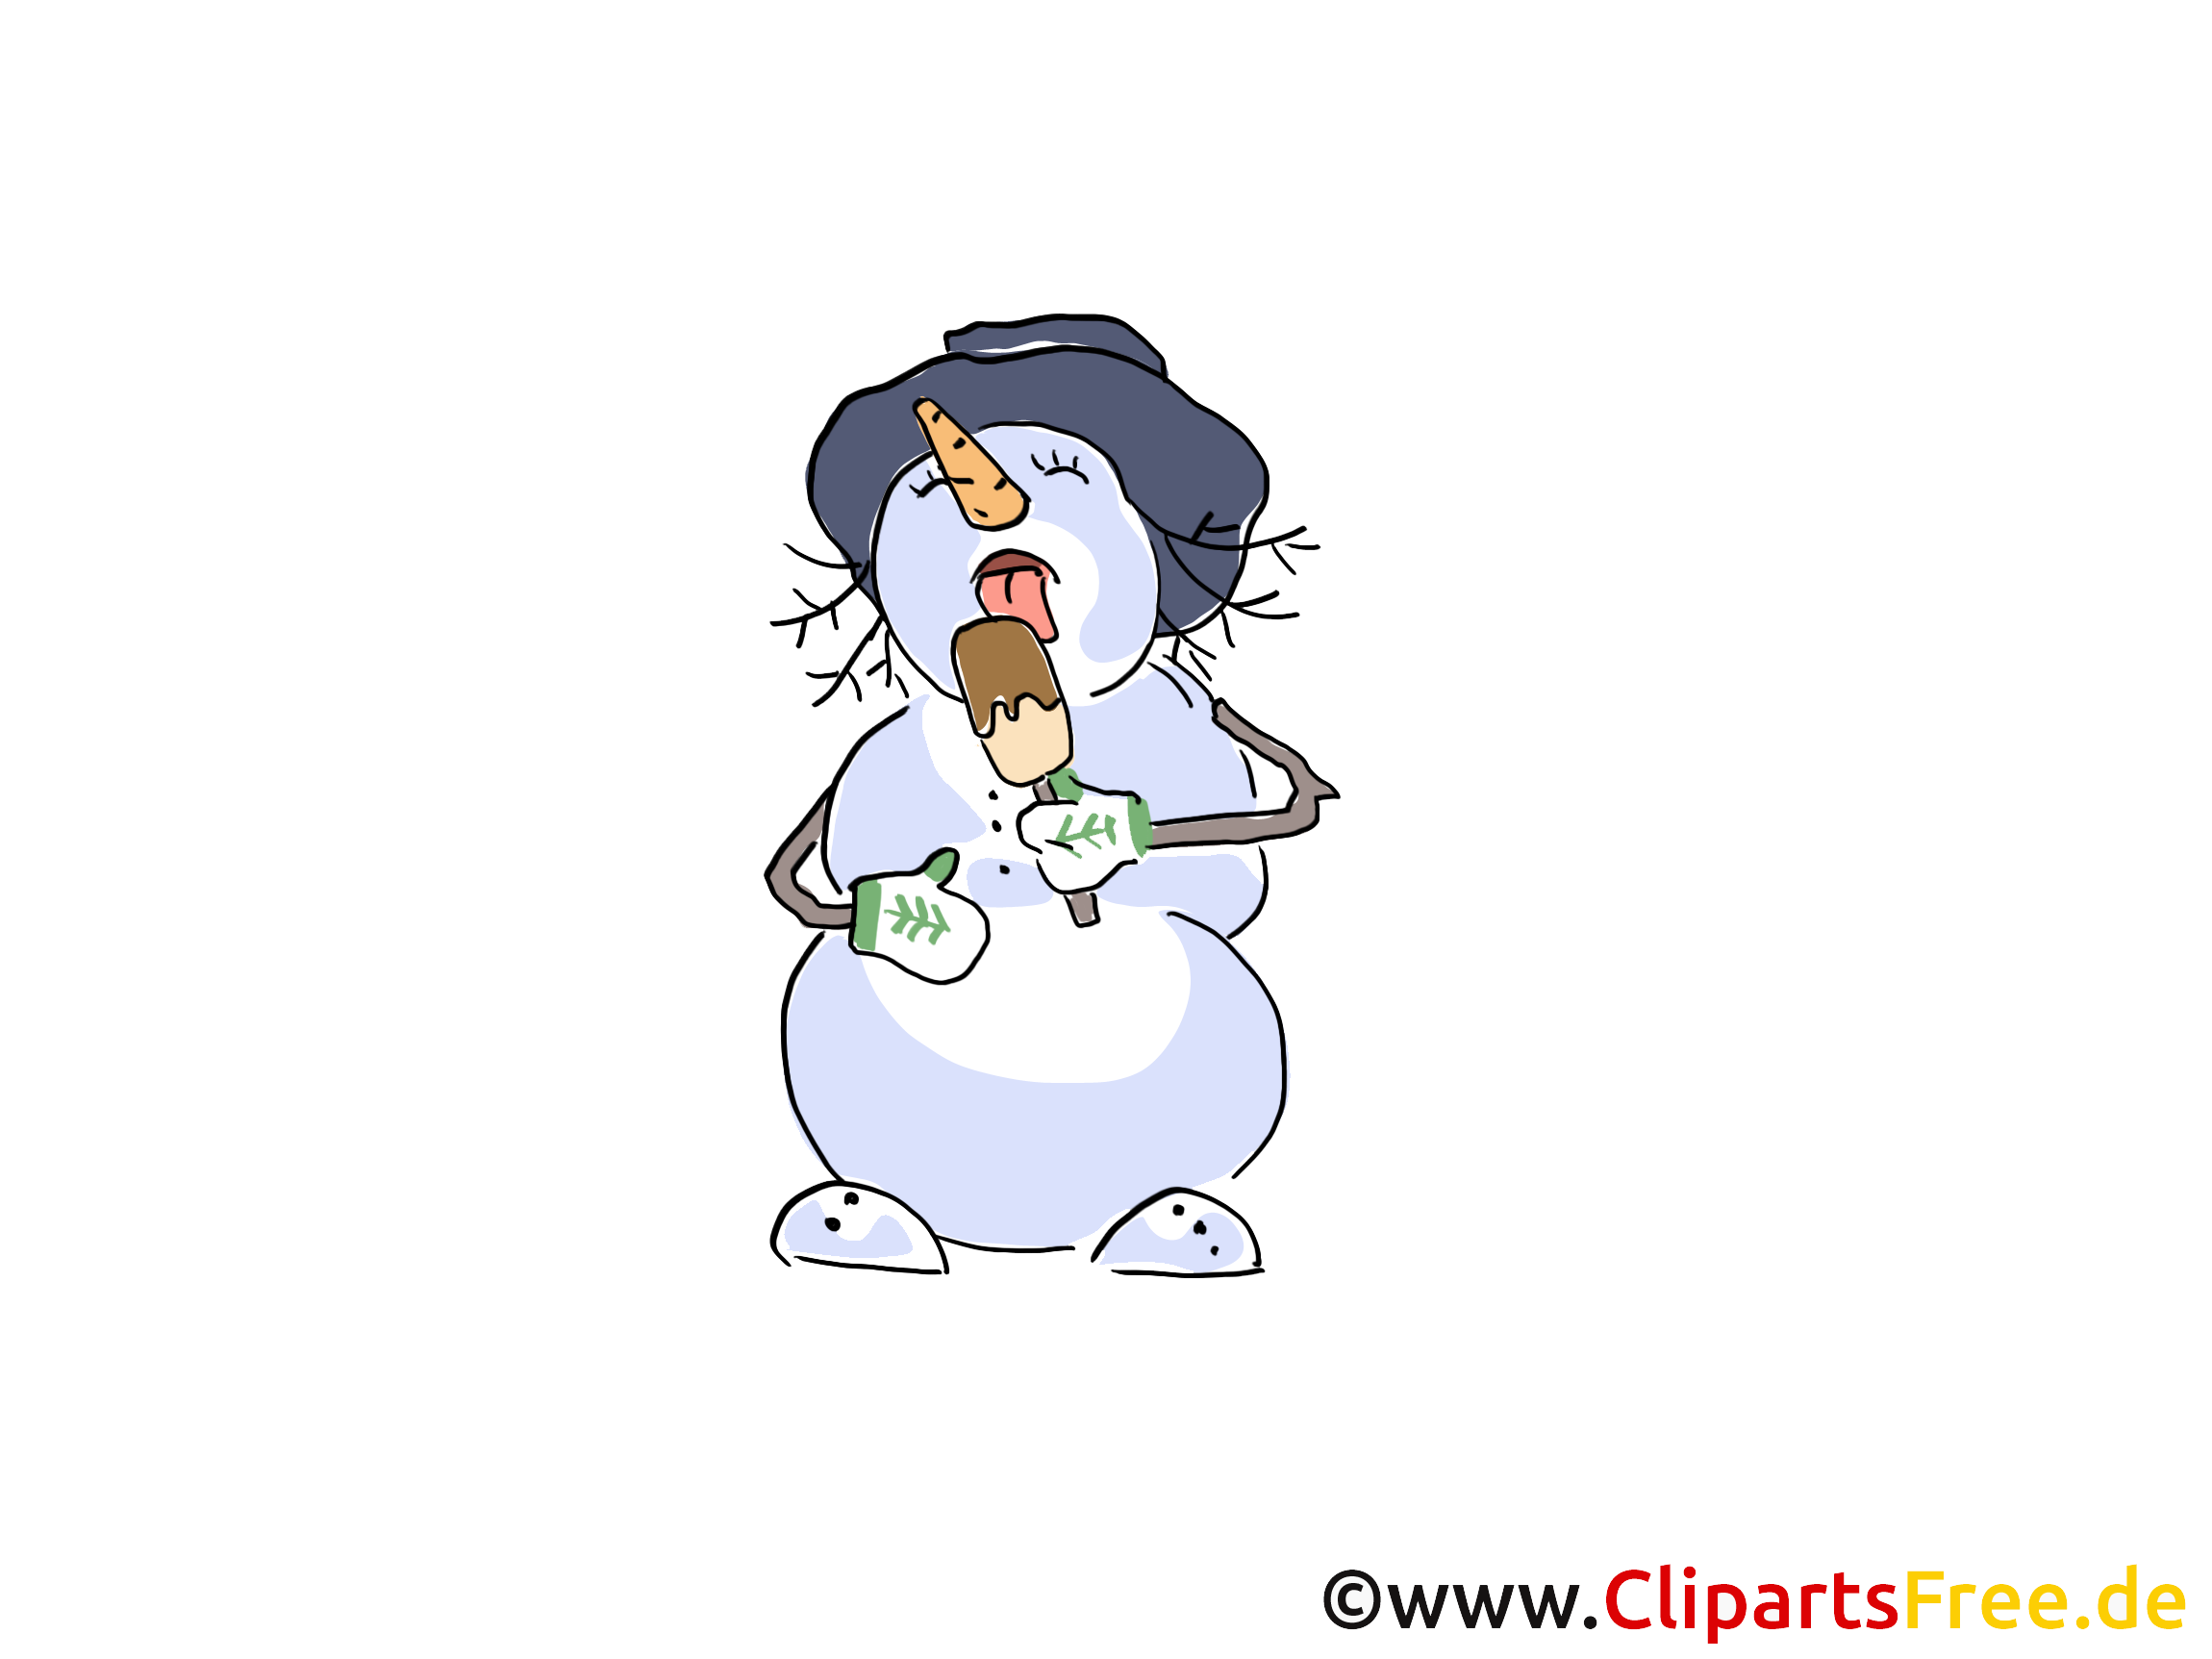 Clip art geburtstag 80 royalty free Related Keywords & Suggestions for Clipart Geburtstag 80 royalty free